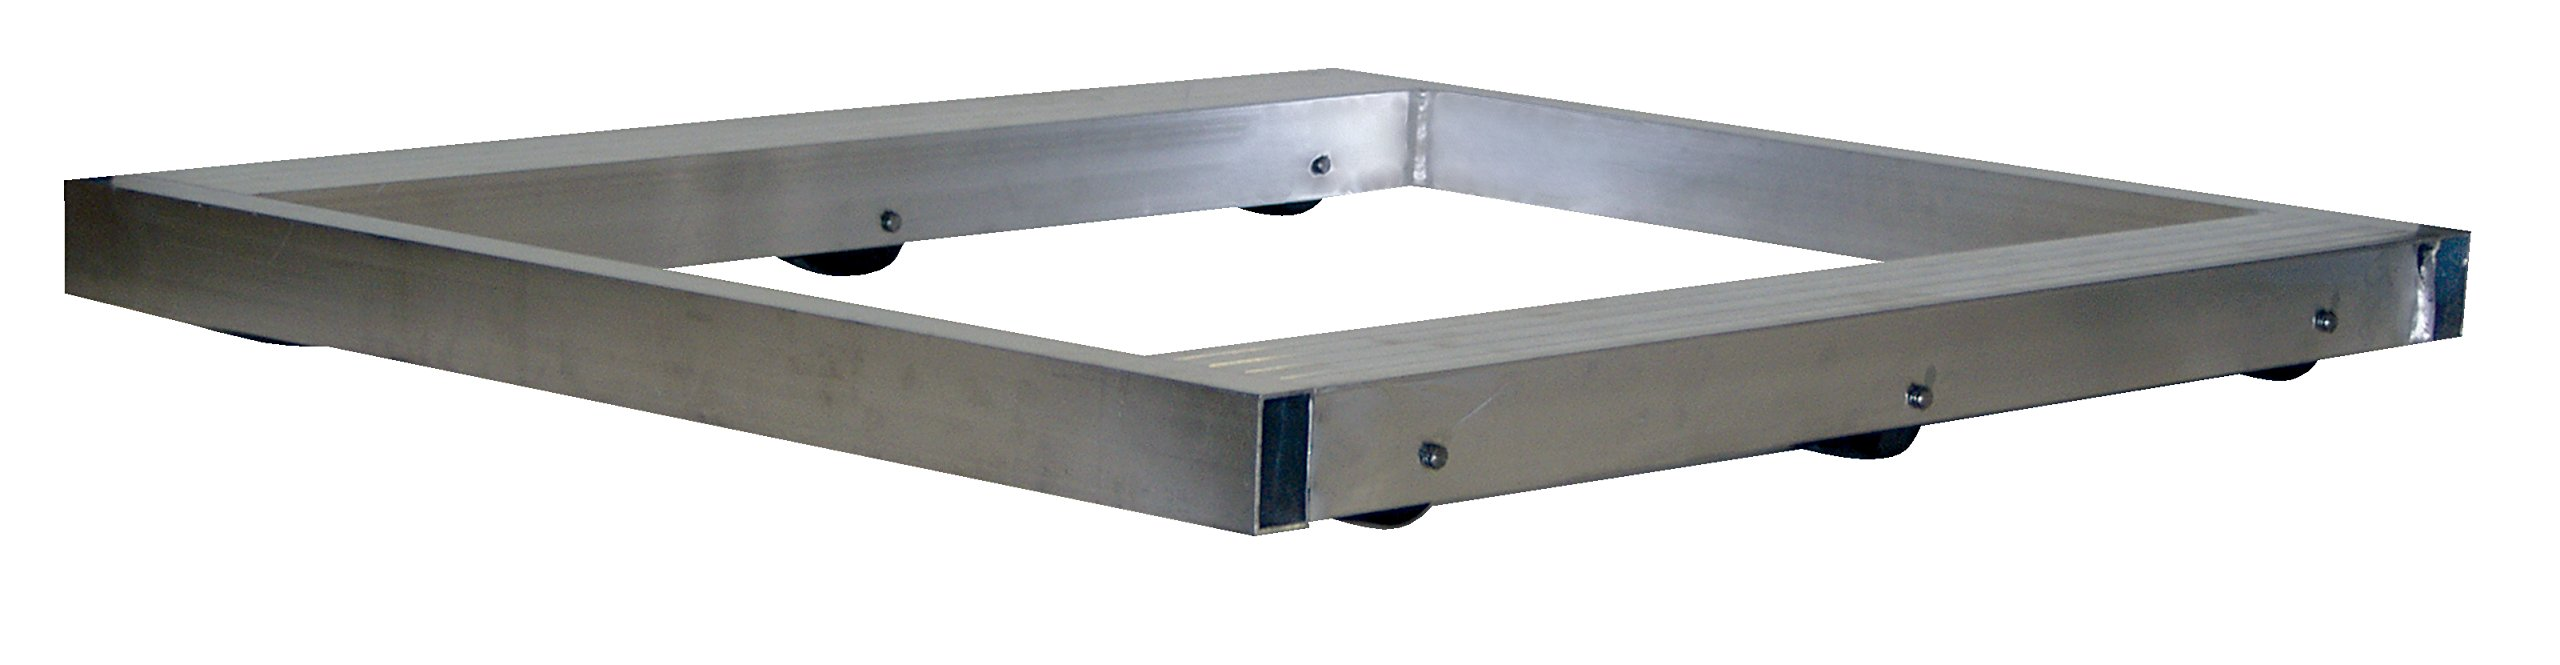 Vestil DOL-3636-6T Pallet Dolly, Tilting, Aluminum, 4,000 lb. Capacity, 4-1/8 x 36 x 36'' by Vestil